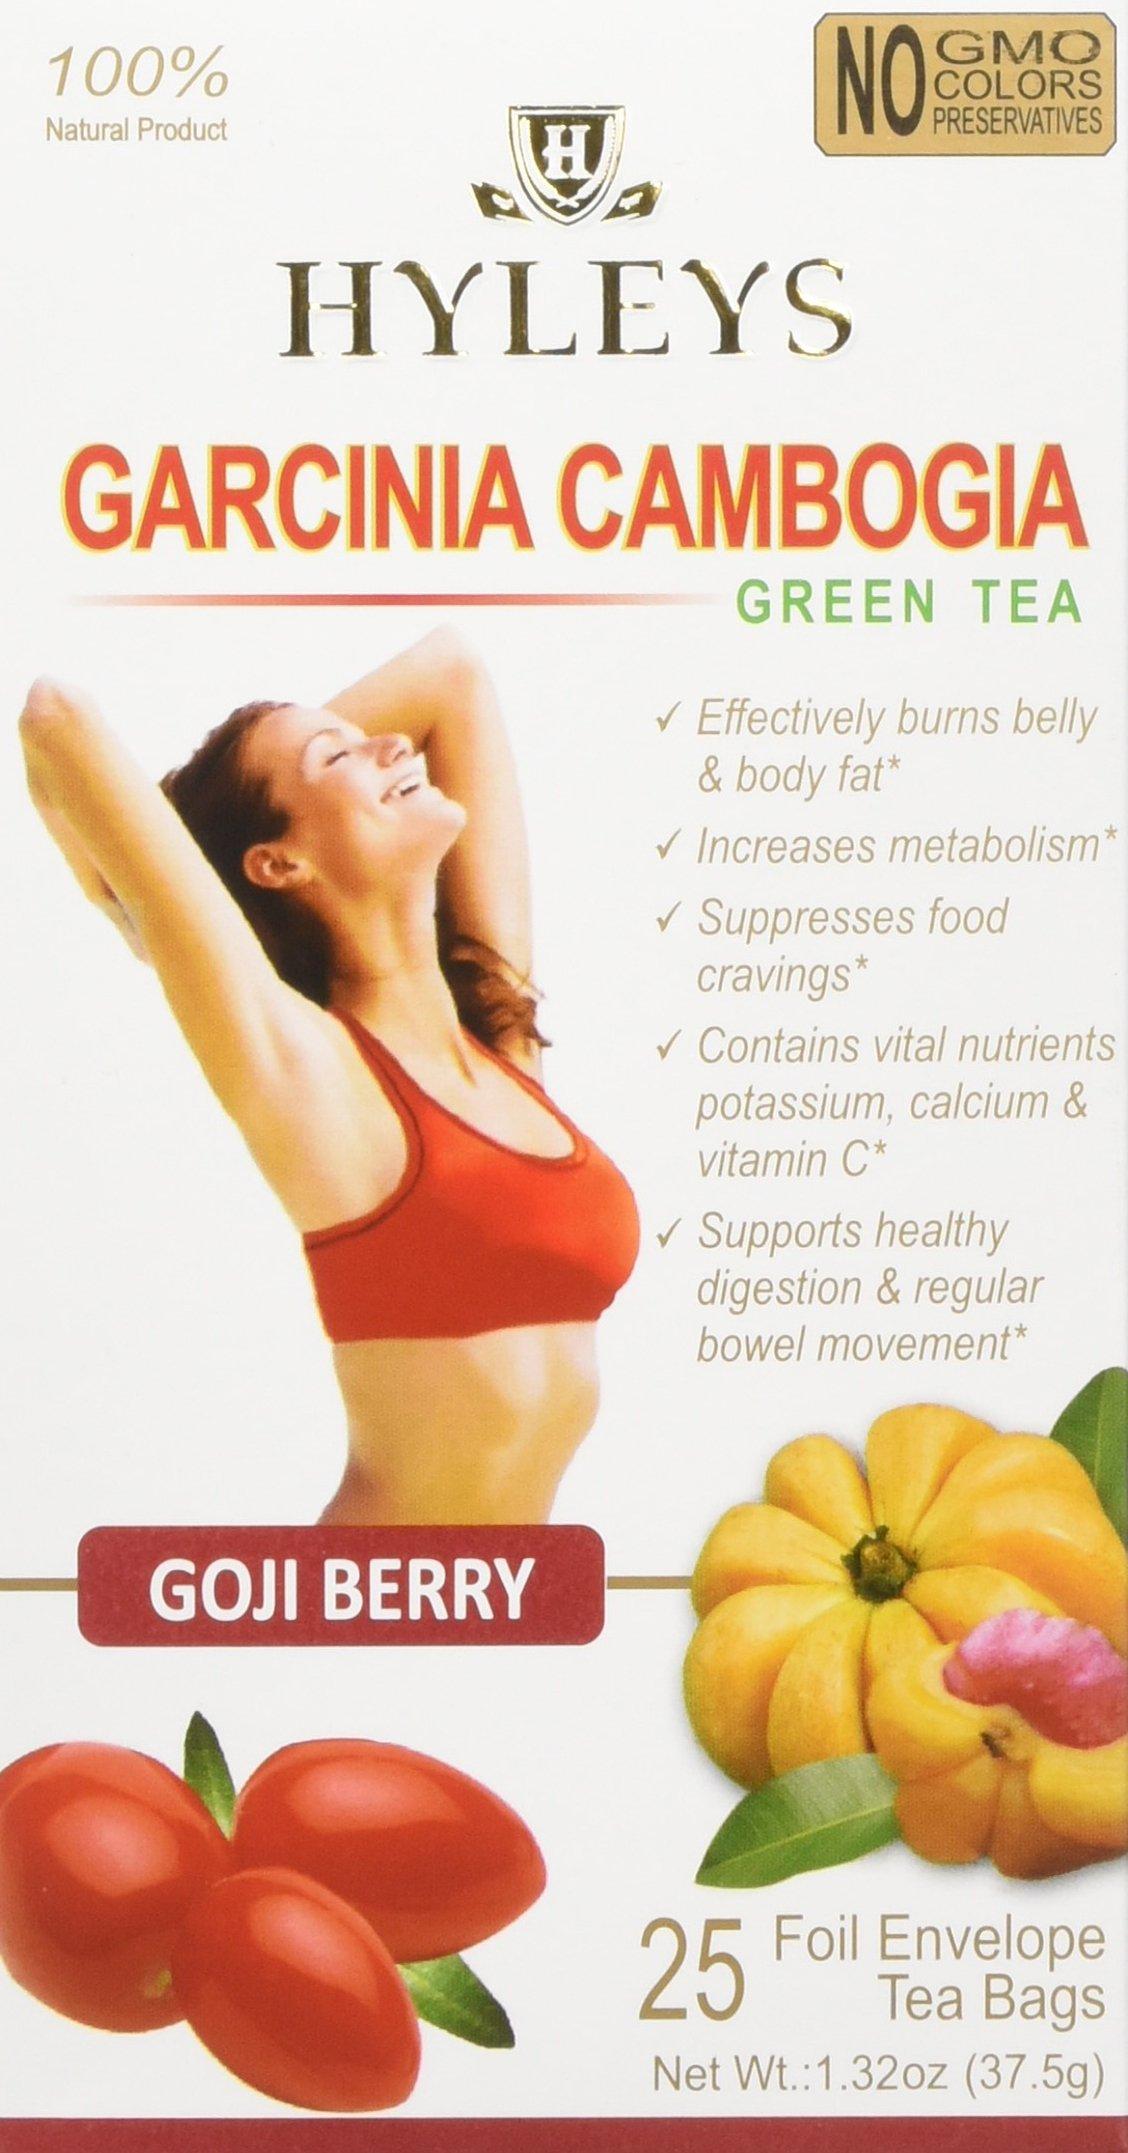 HYLEYS Tea Garcinia Cambogia & Goji Berry, 12 Count (Pack Of 12)